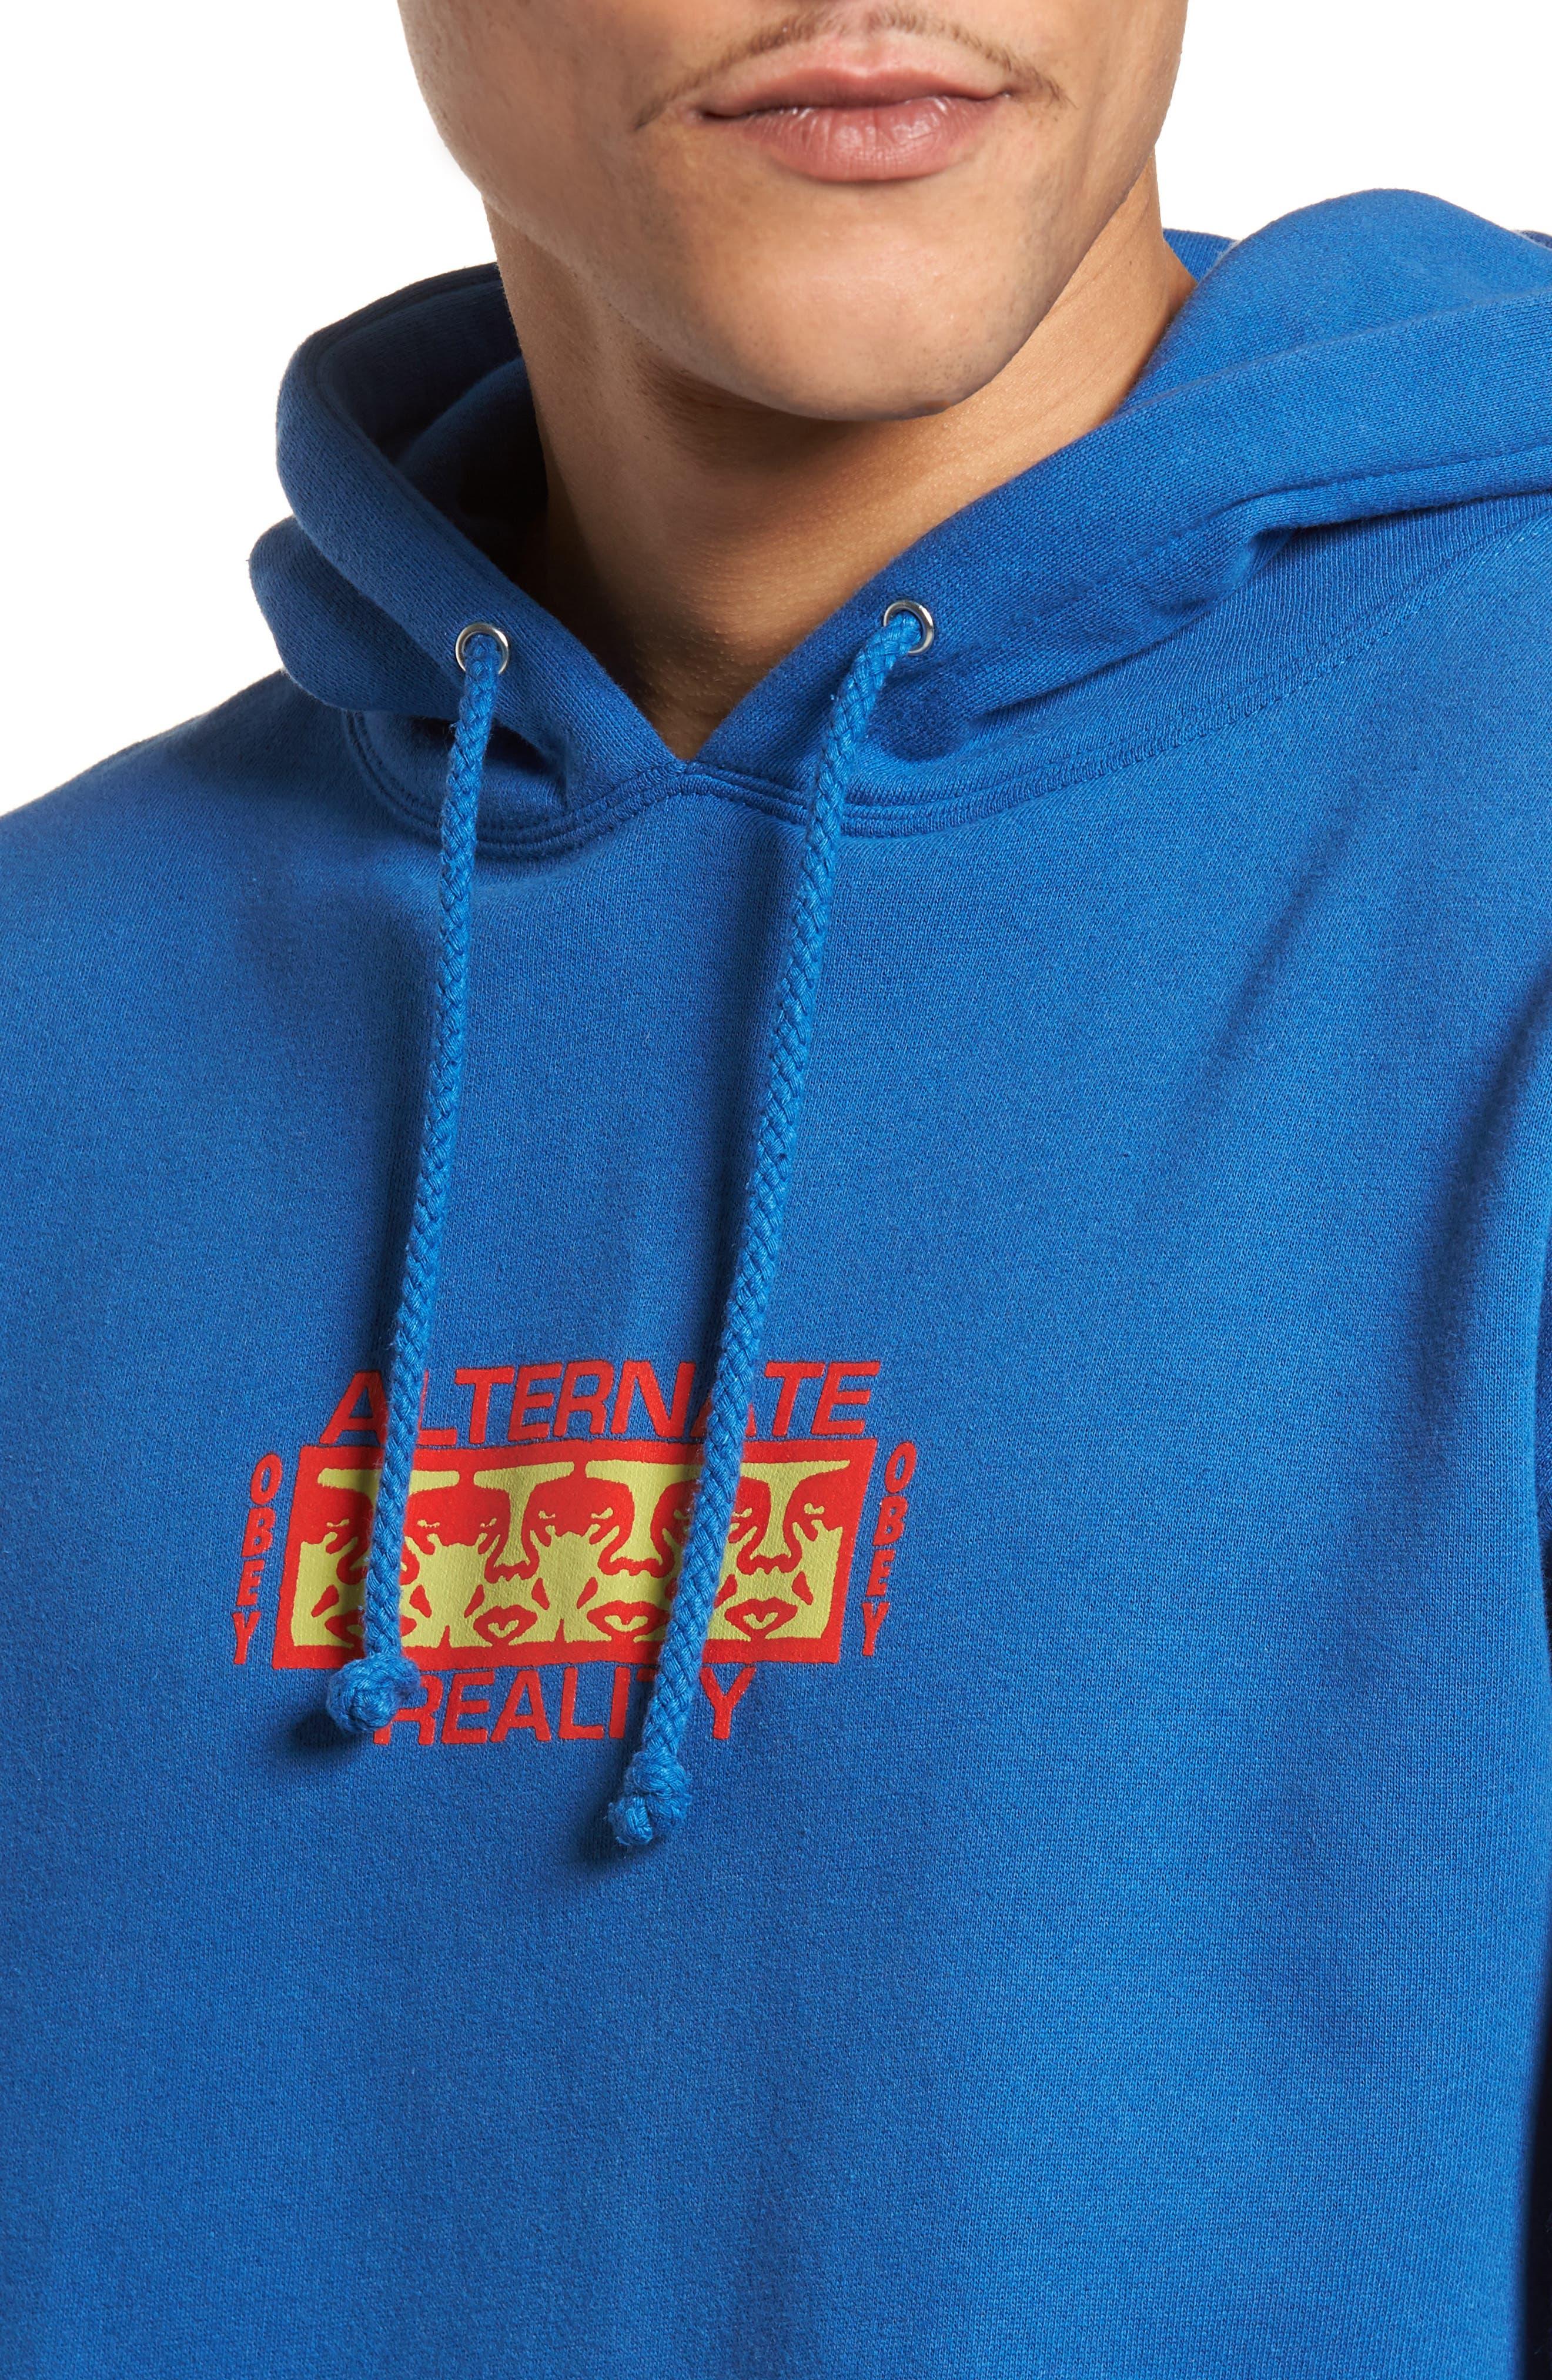 Alternate Reality Hoodie Sweatshirt,                             Alternate thumbnail 4, color,                             Royal Blue